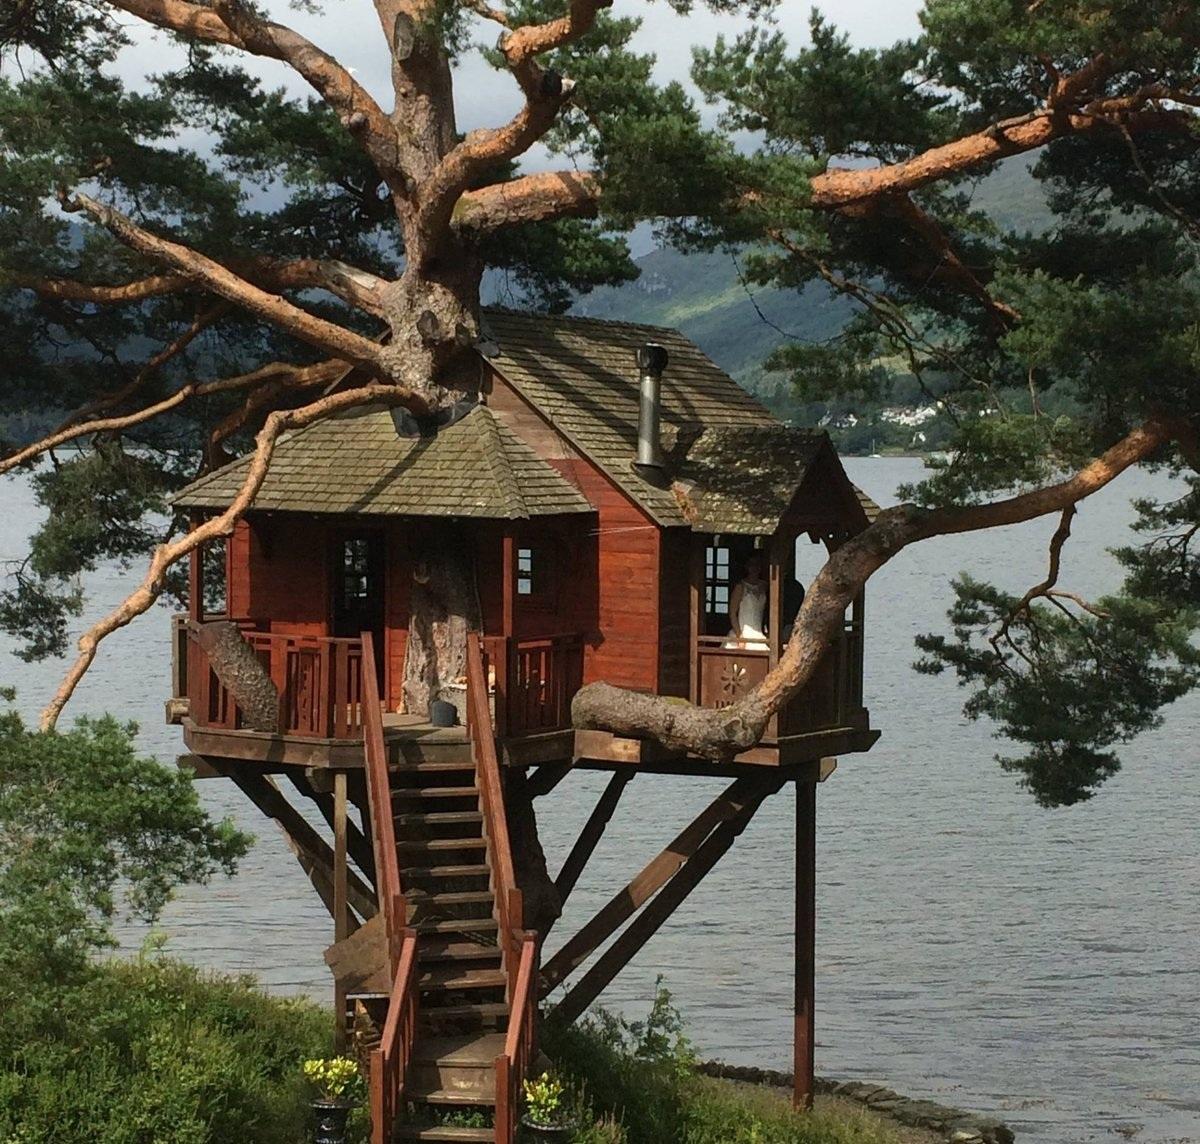 Картинки домиков с дерева